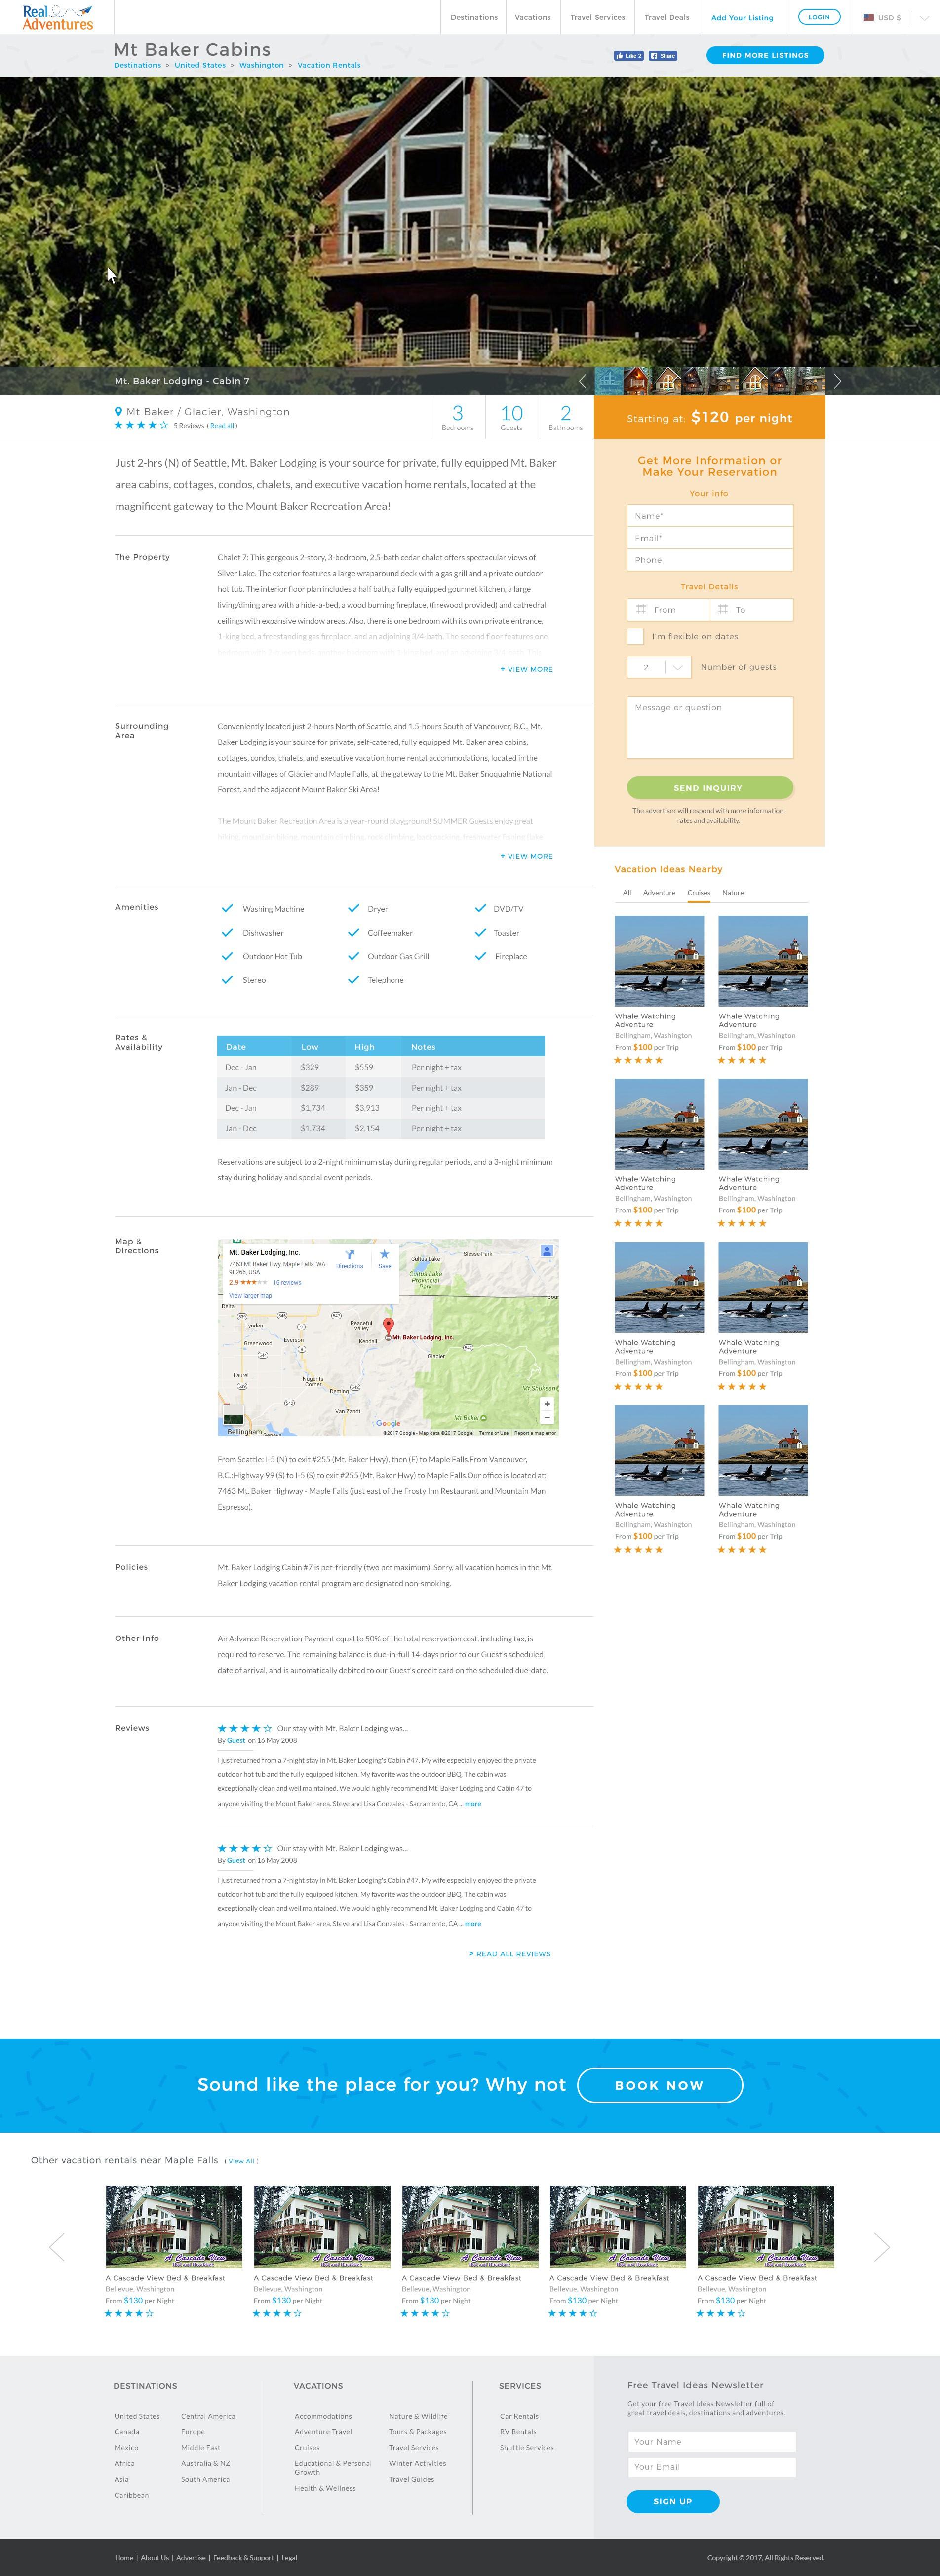 Design an inspiring adventure travel website for RealAdventures